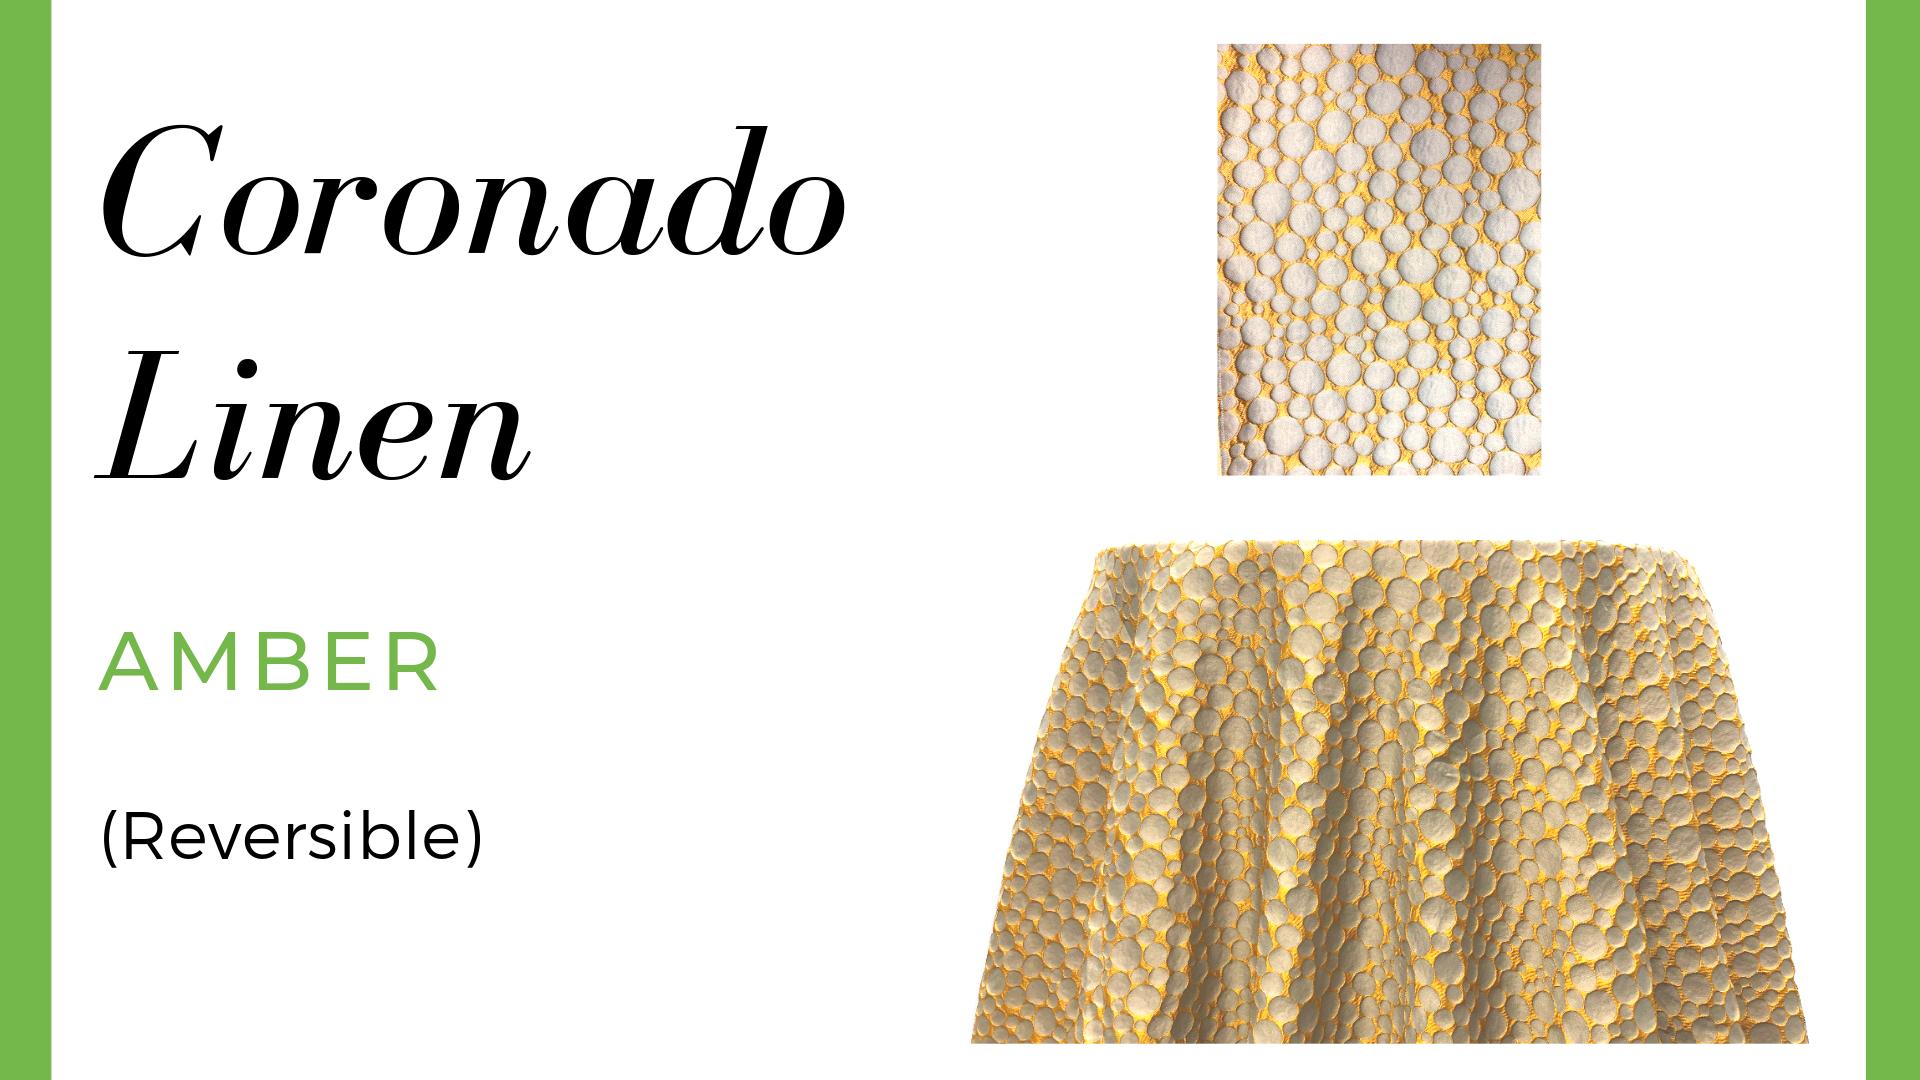 Coronado Linen - Amber (Reversible)